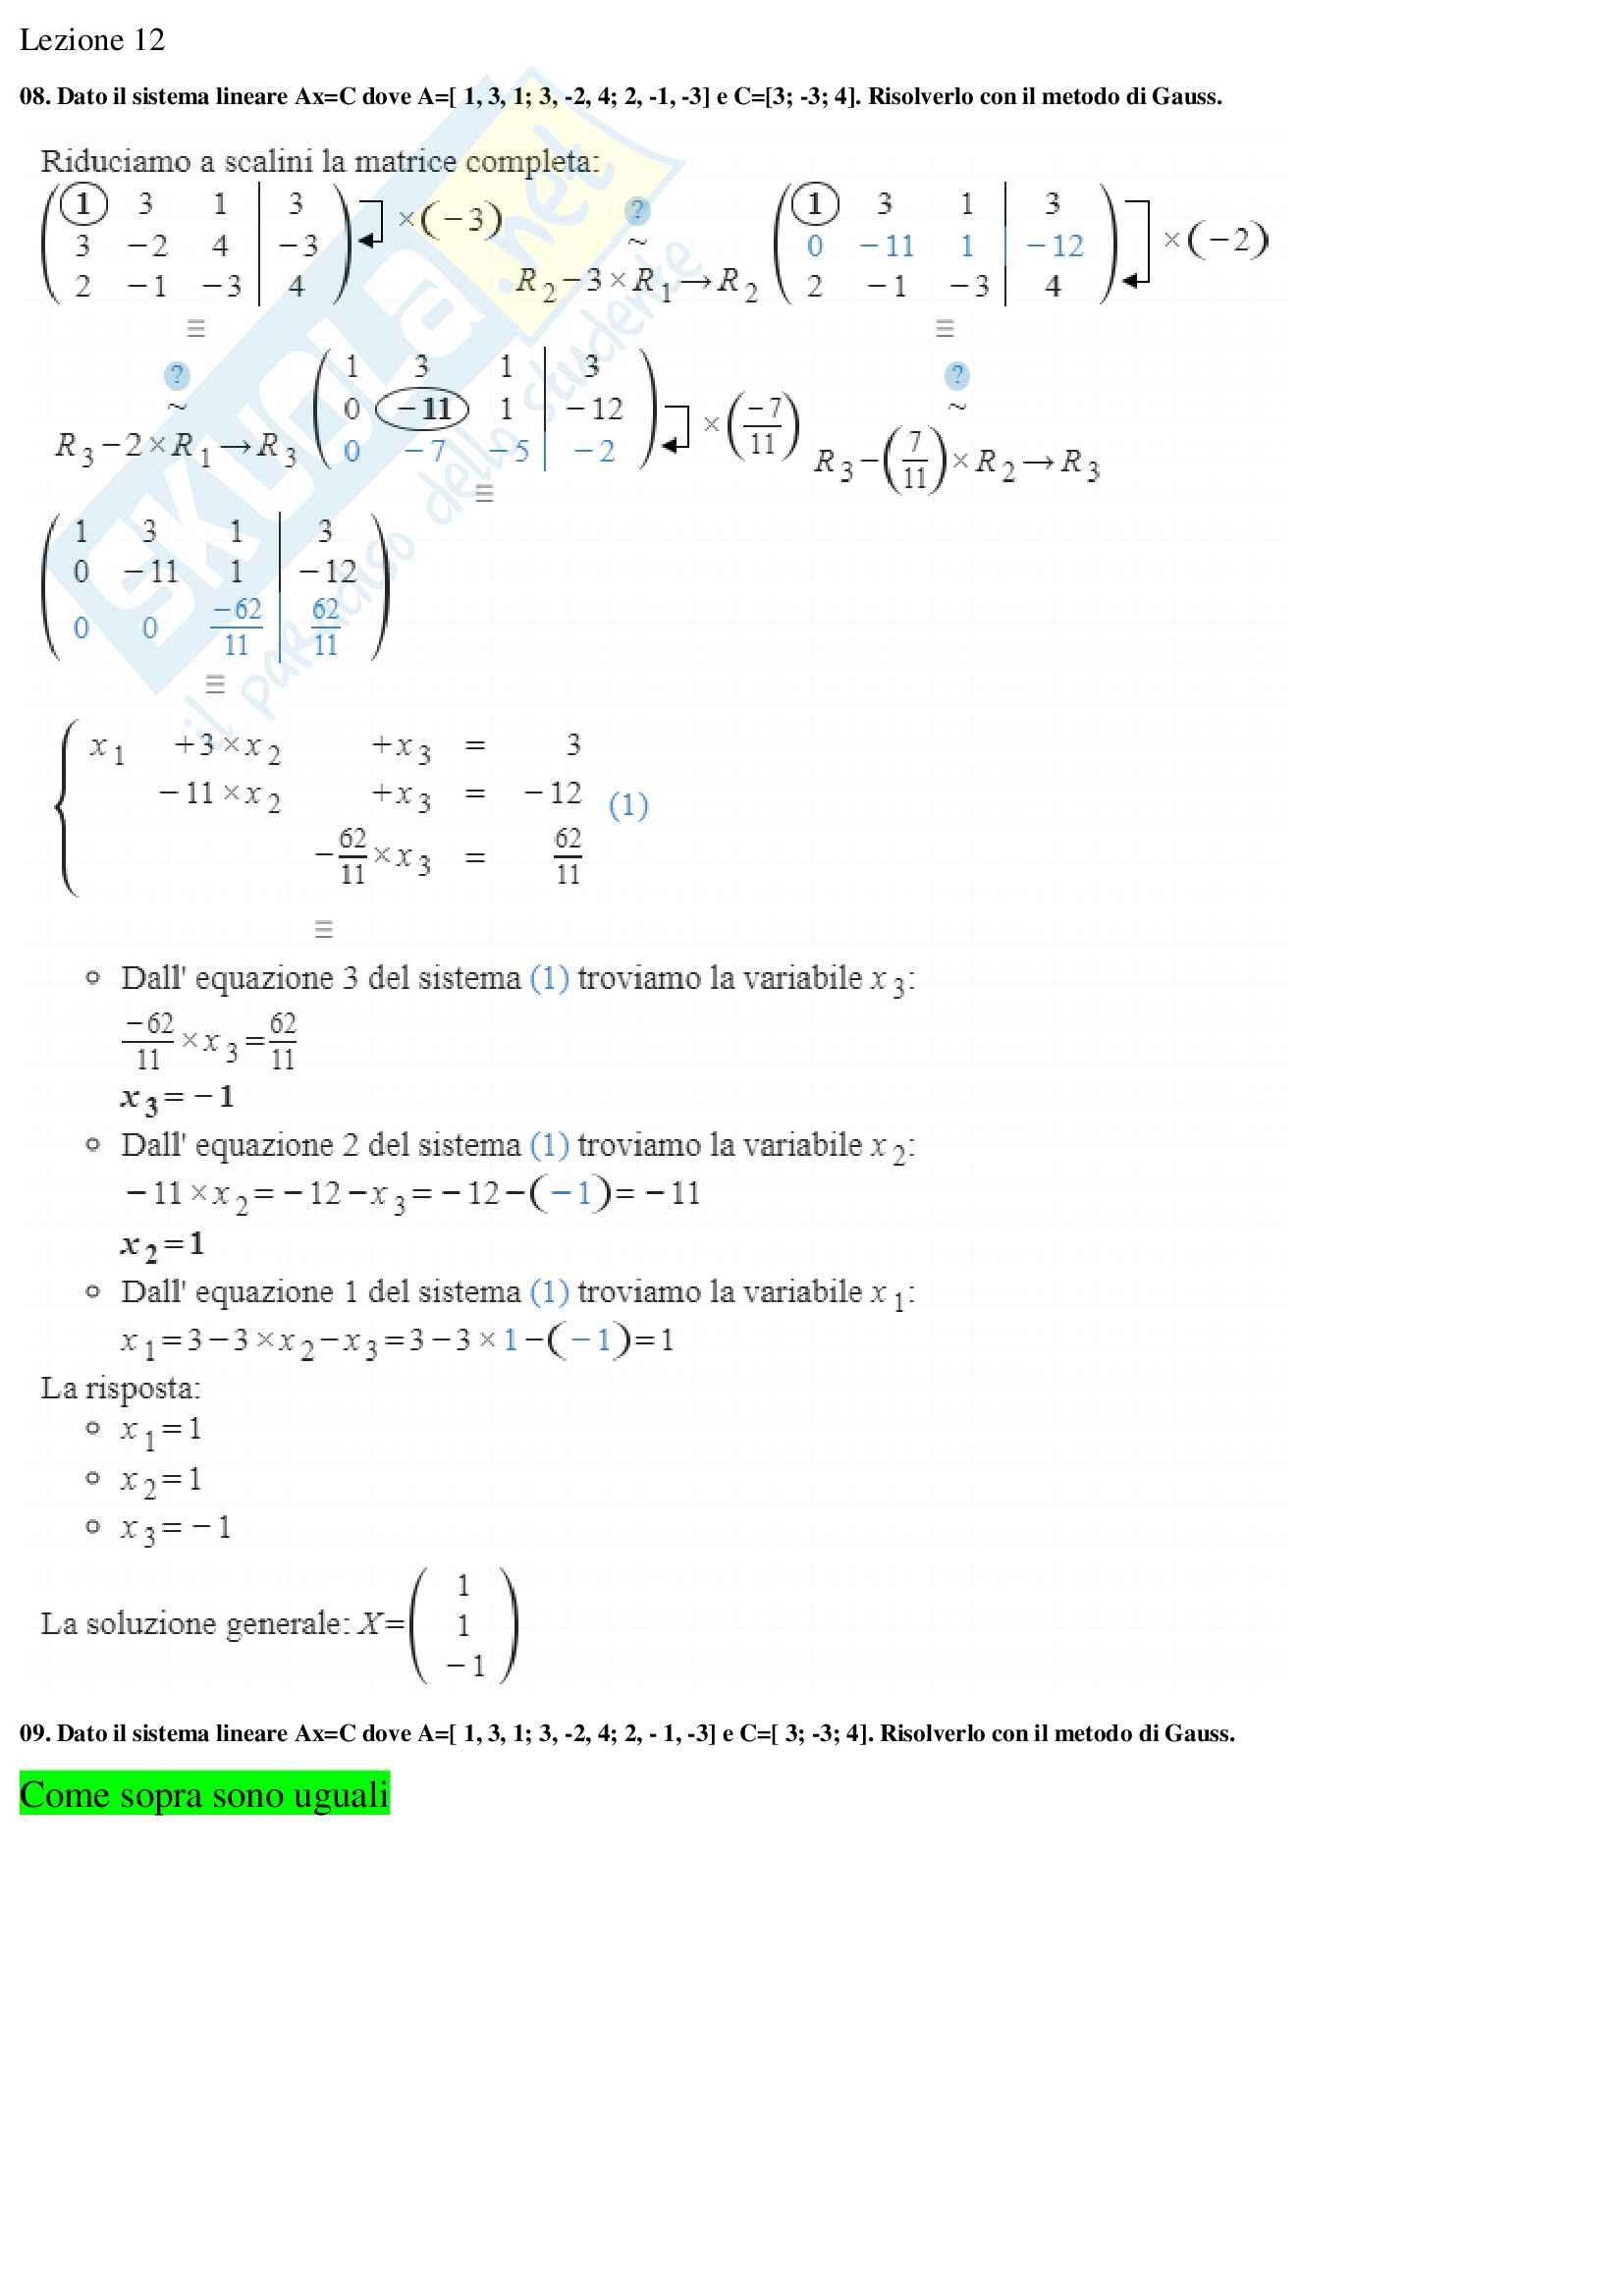 Domande aperte analisi numerica